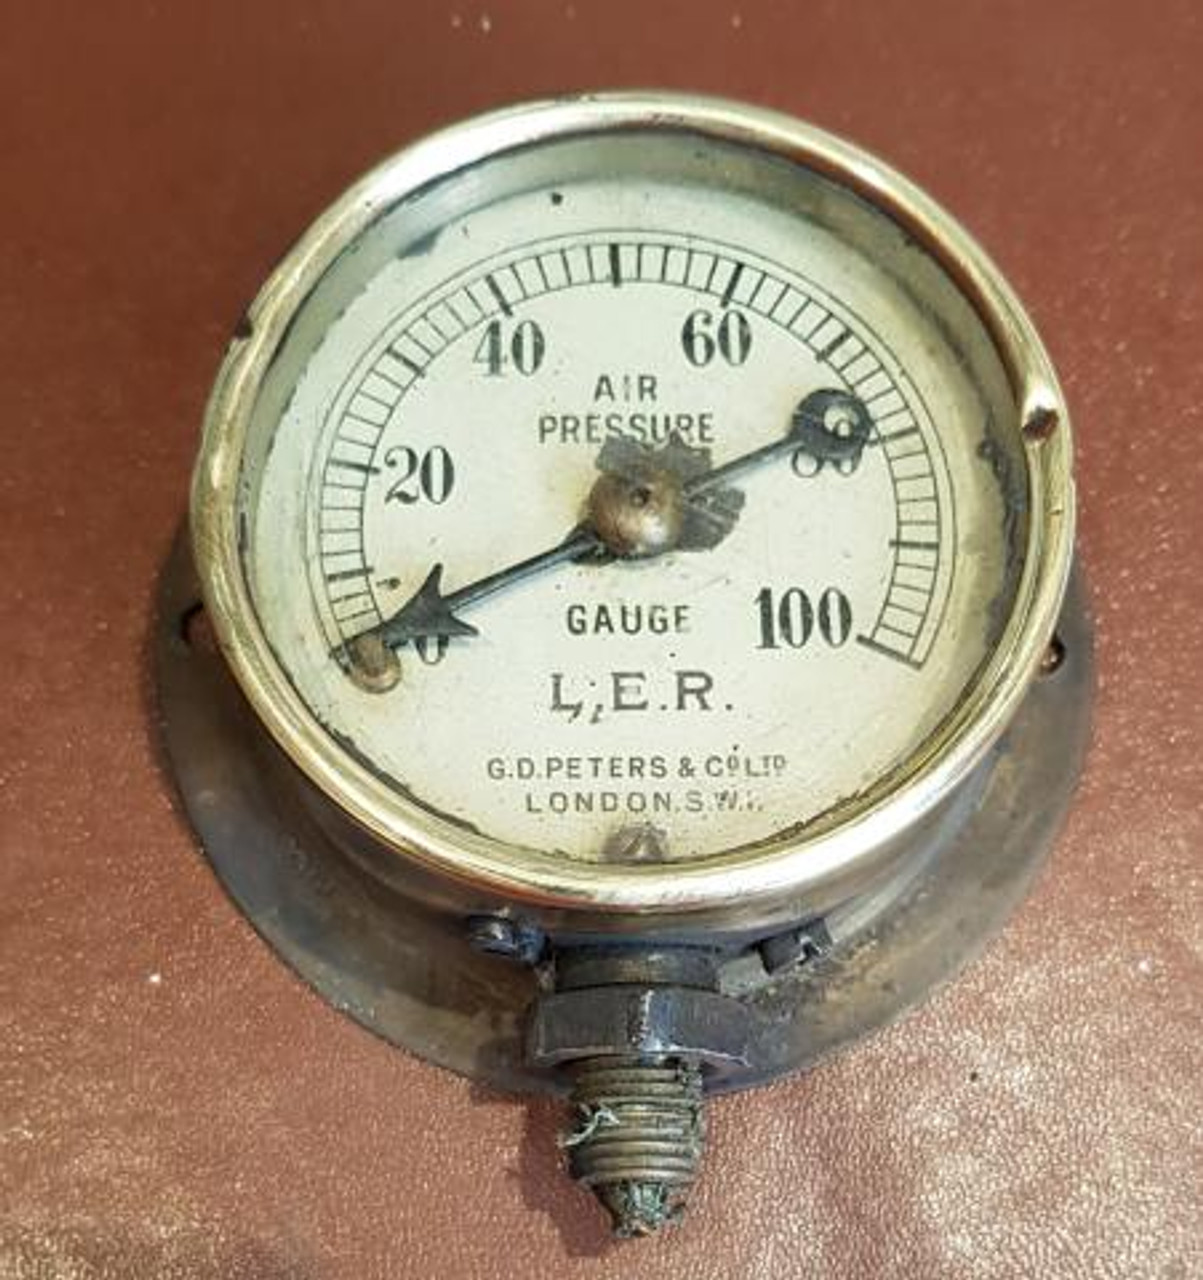 VT 2339 - L.E.R AIR PRESSURE GAUGE